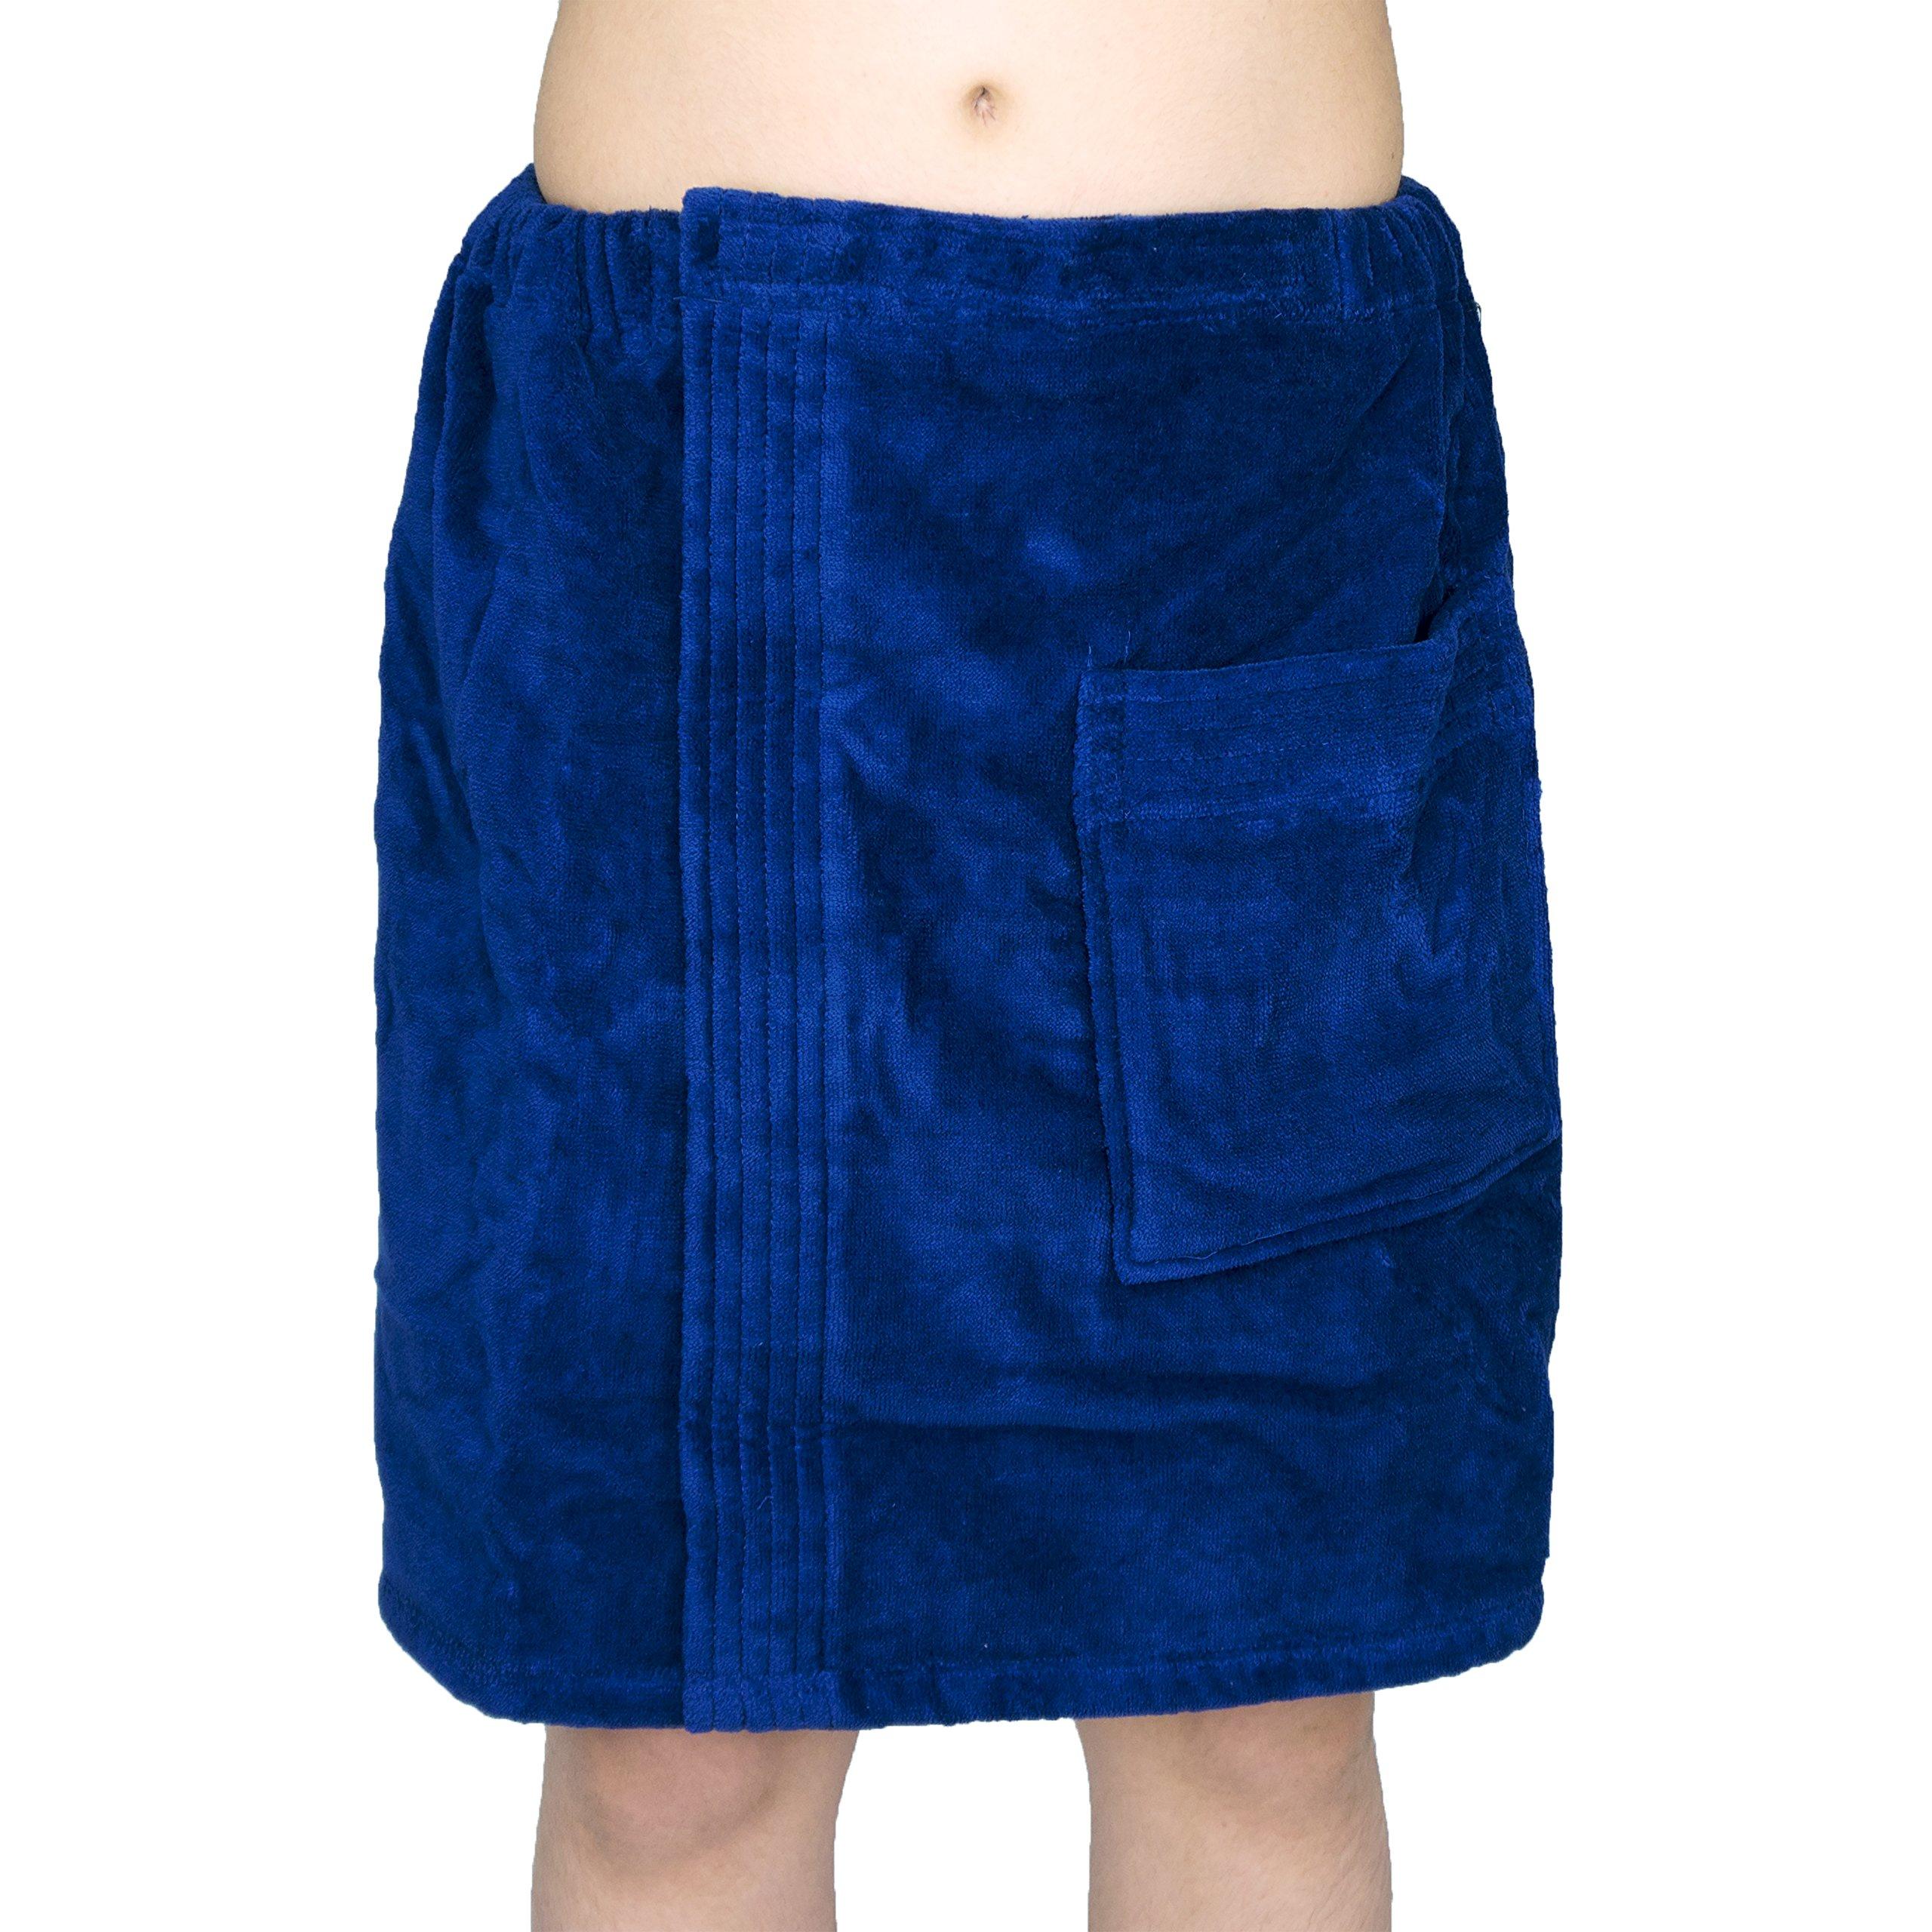 Men's 100% Natural Turkish Cotton Terry Velour Body Wrap Bath Spa Towel (Navy)